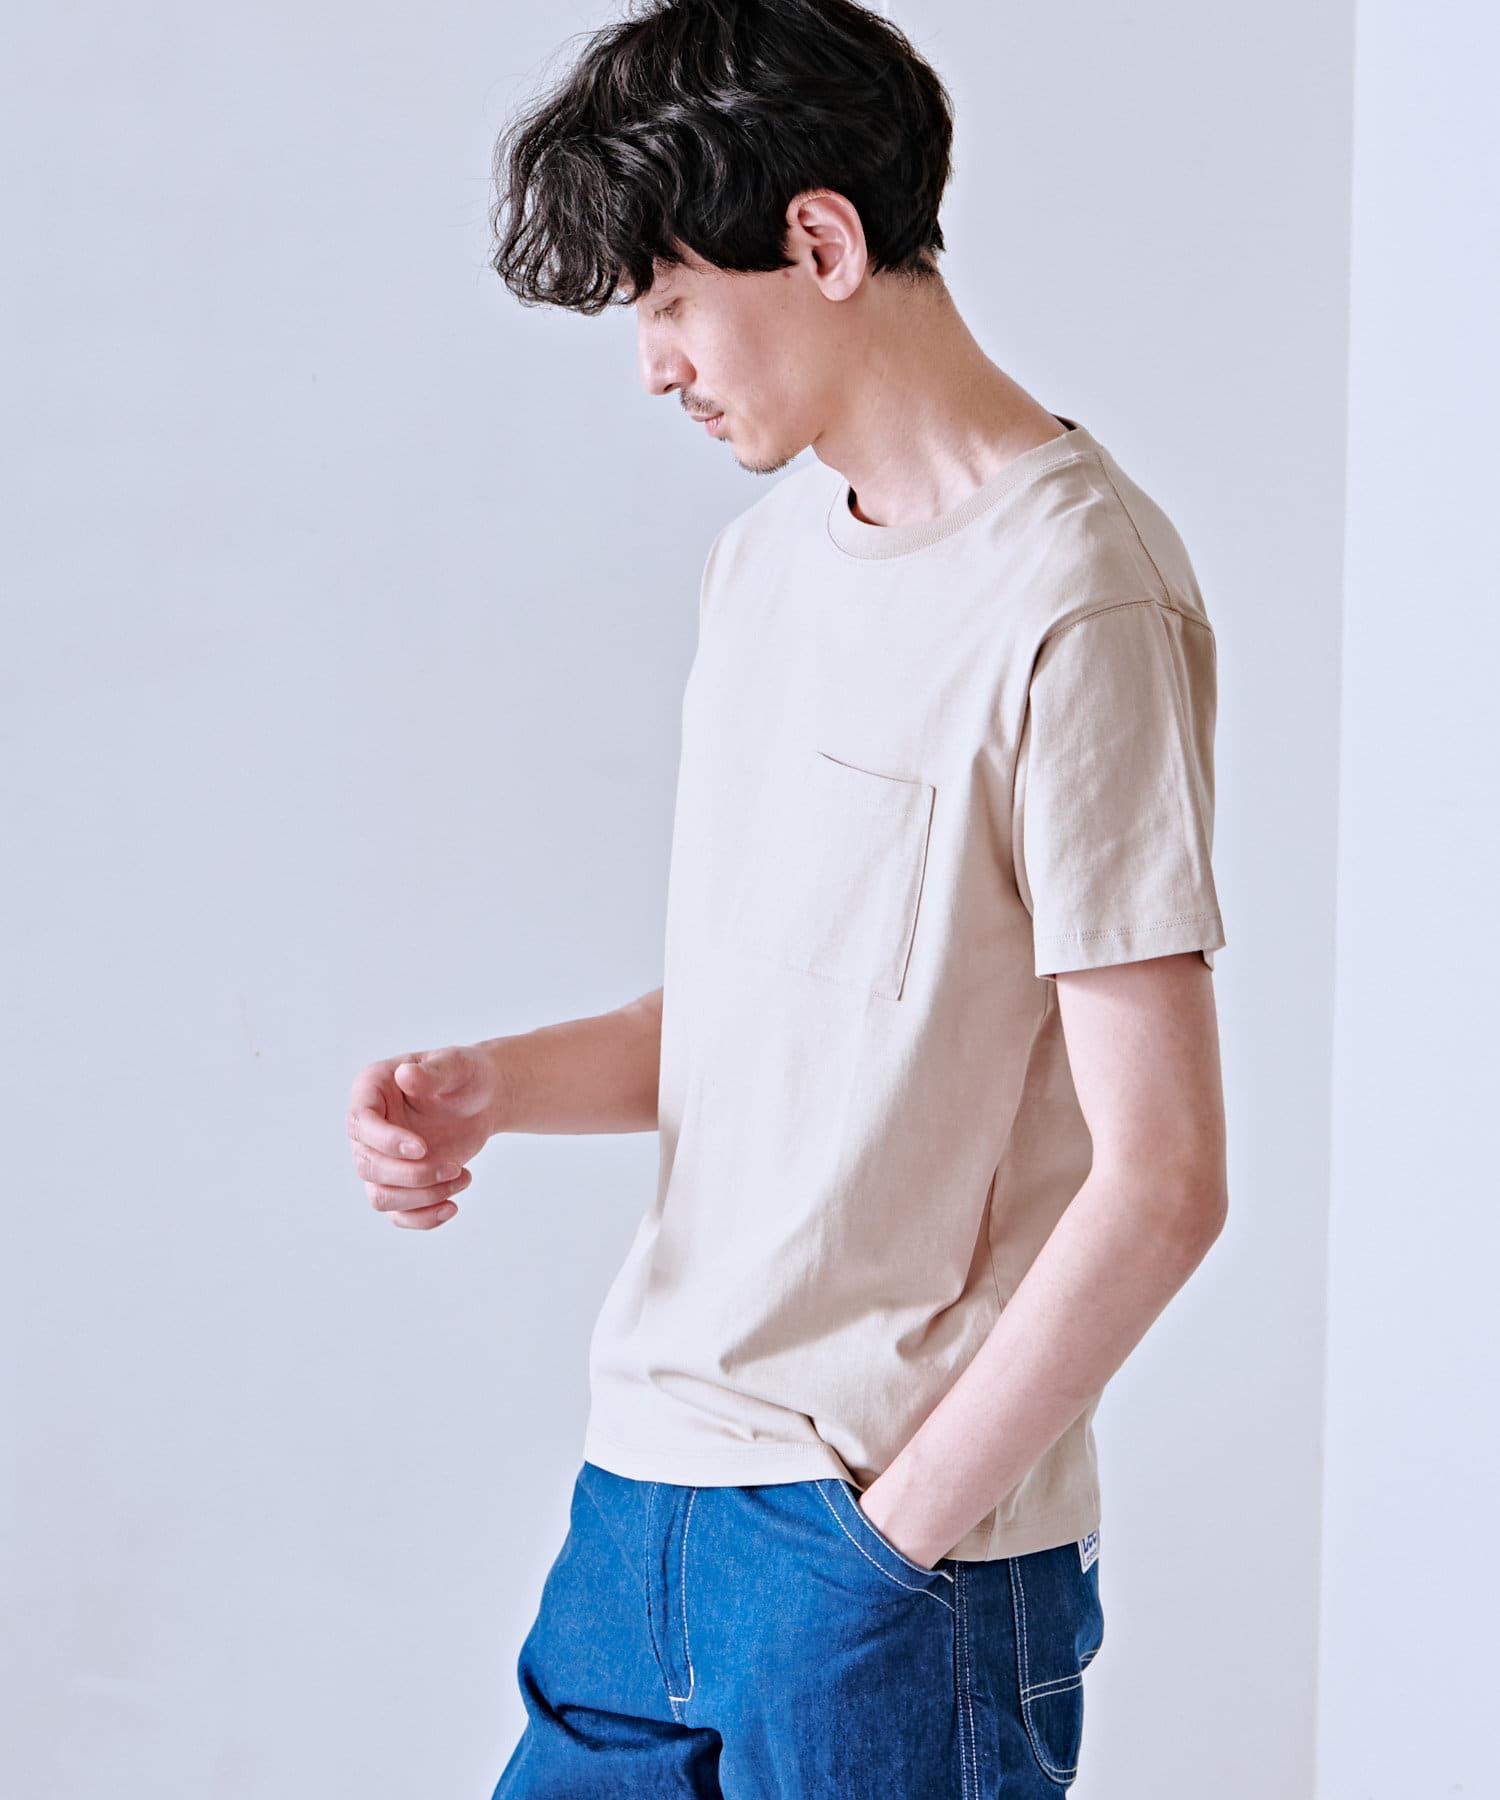 Discoat(ディスコート) メンズ USコットン胸ポケTシャツ ライトグレー